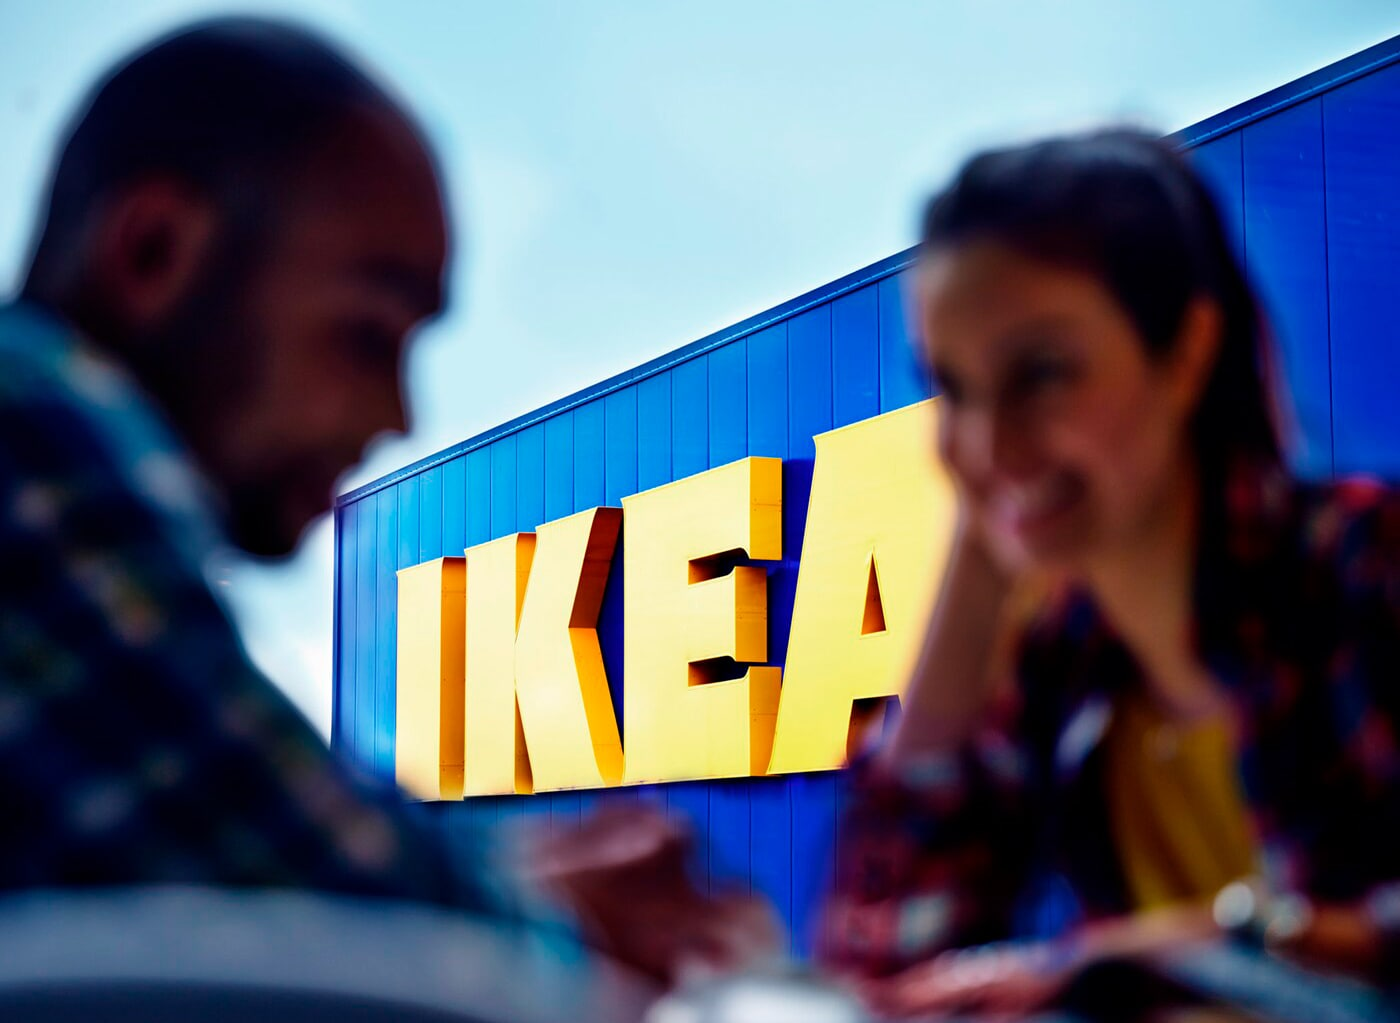 Par pred pročeljem trgovine IKEA, z izostrenim živo rumenim logotipom trgovine IKEA.